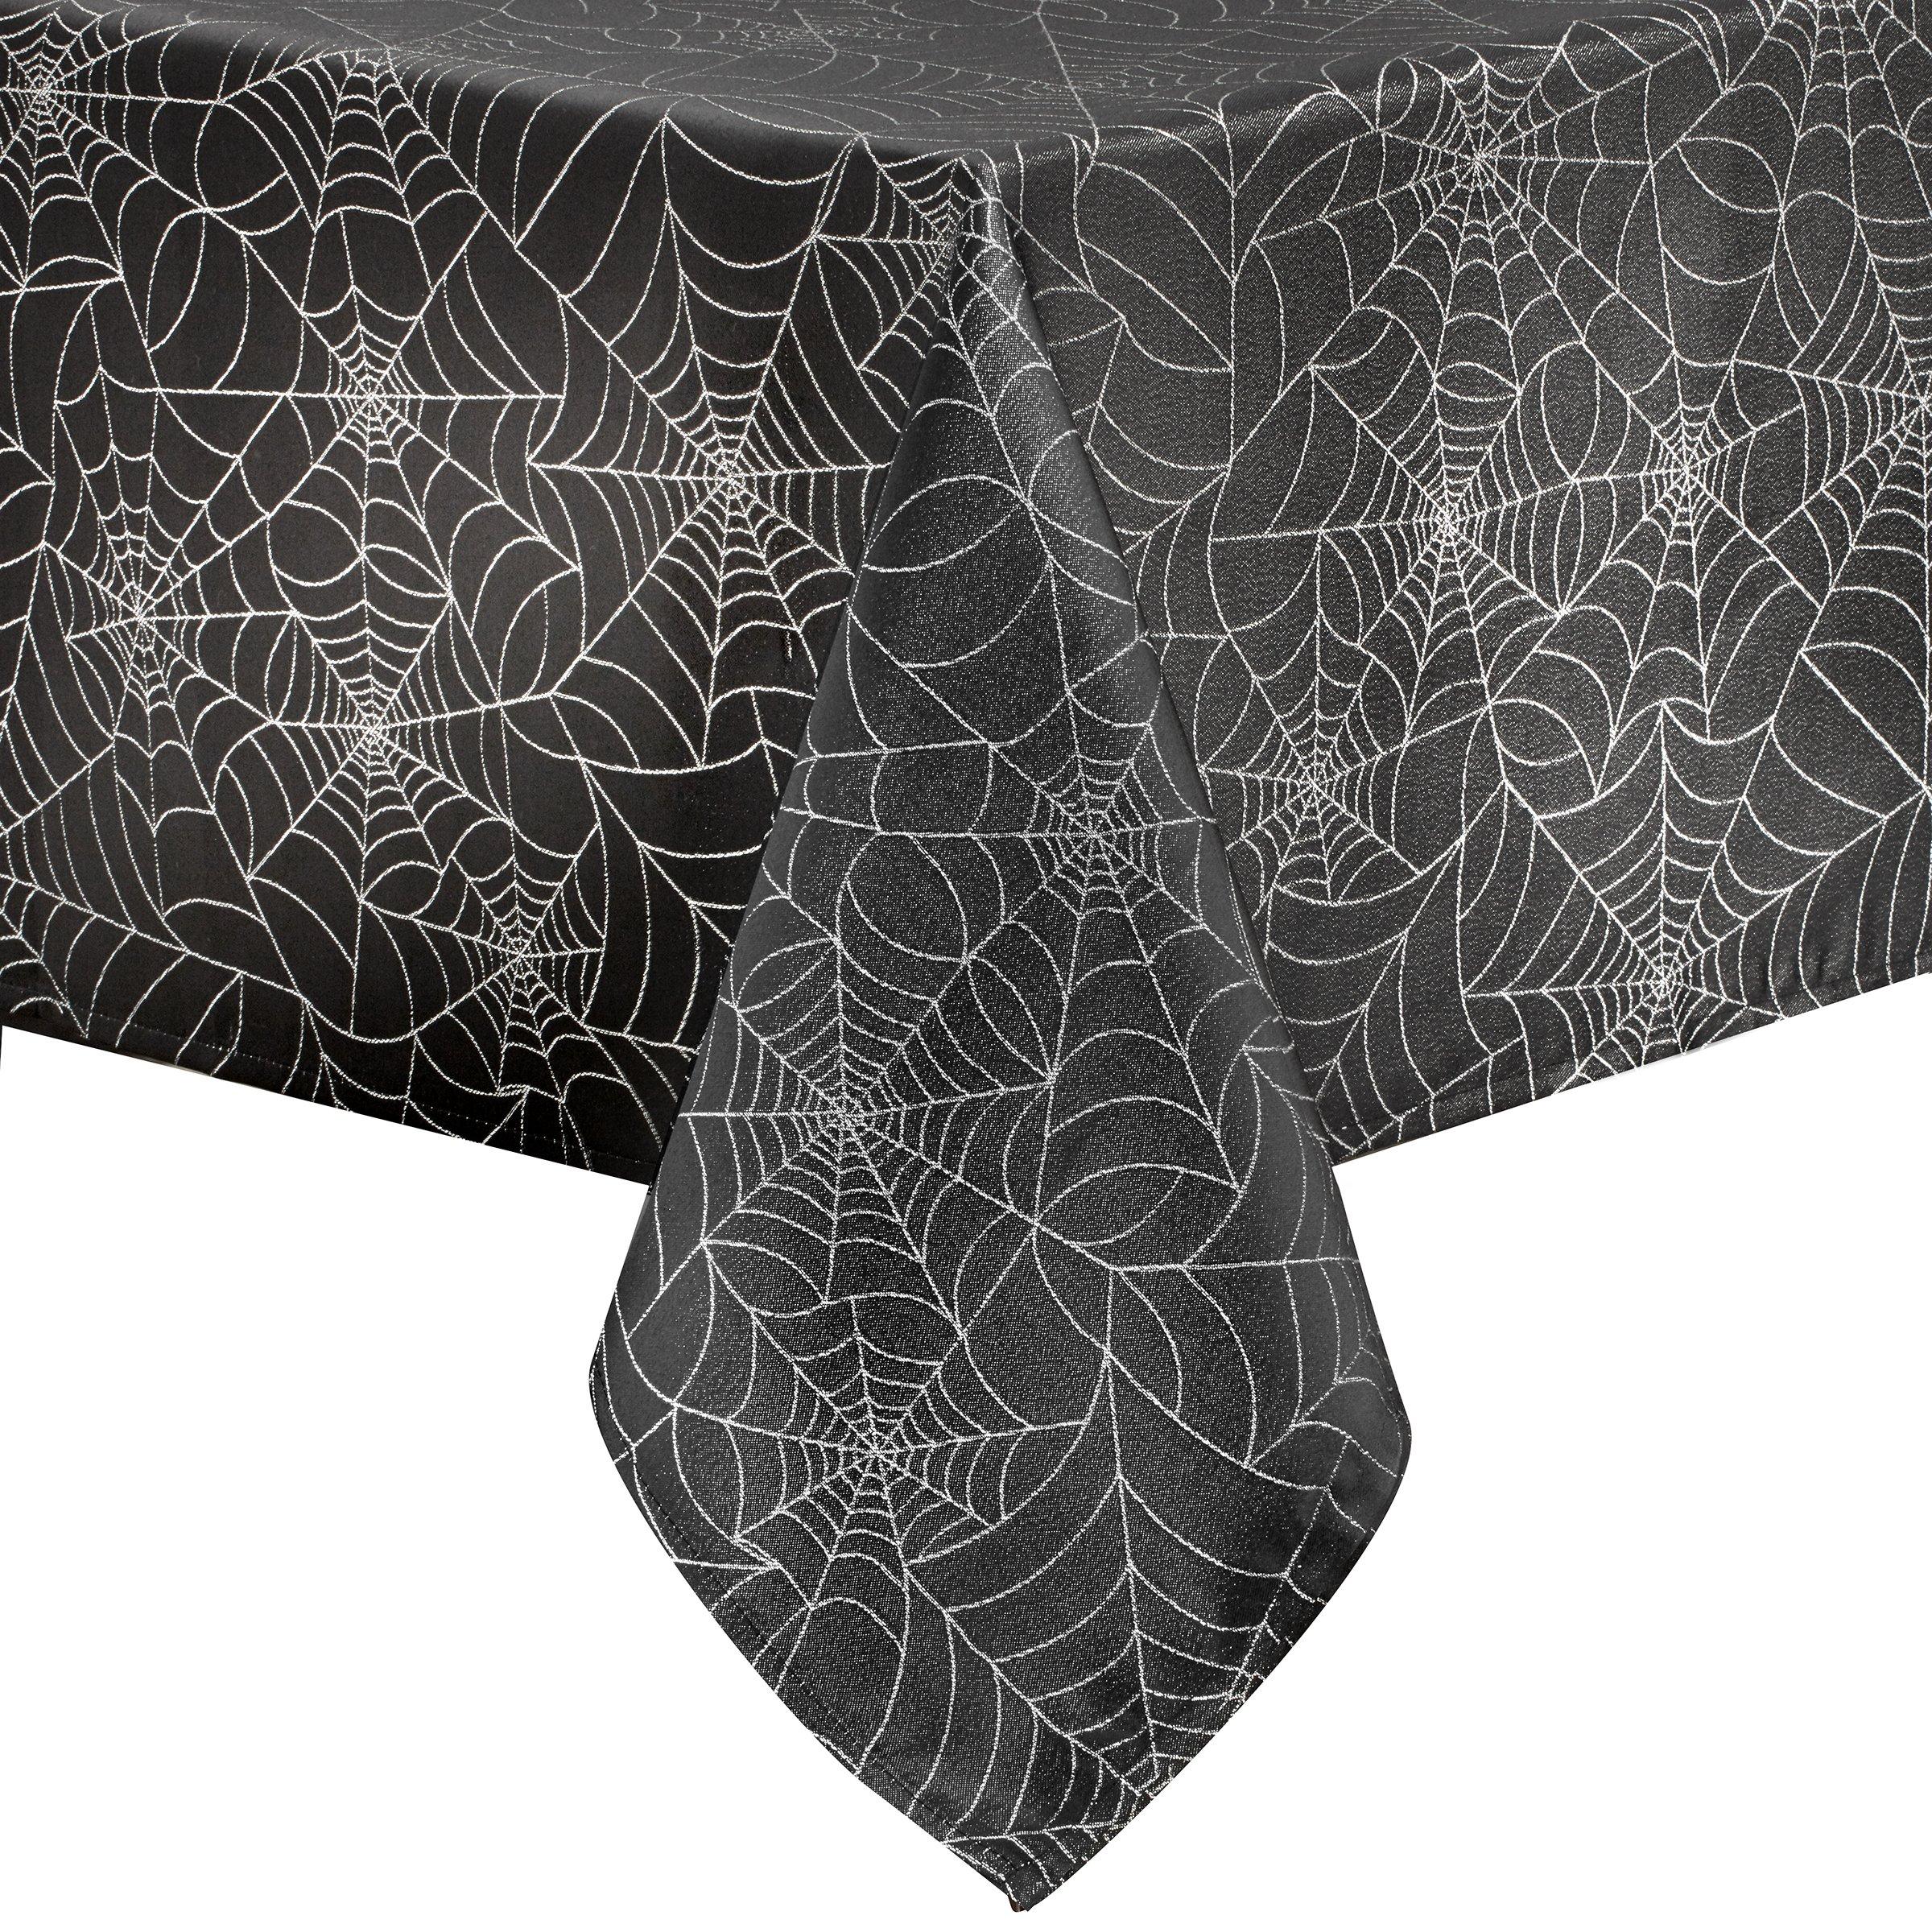 Benson Mills Twinkle Halloween Spider Web Fabric Metallic Tablecloth (Black, 52'' x 52'' Square)